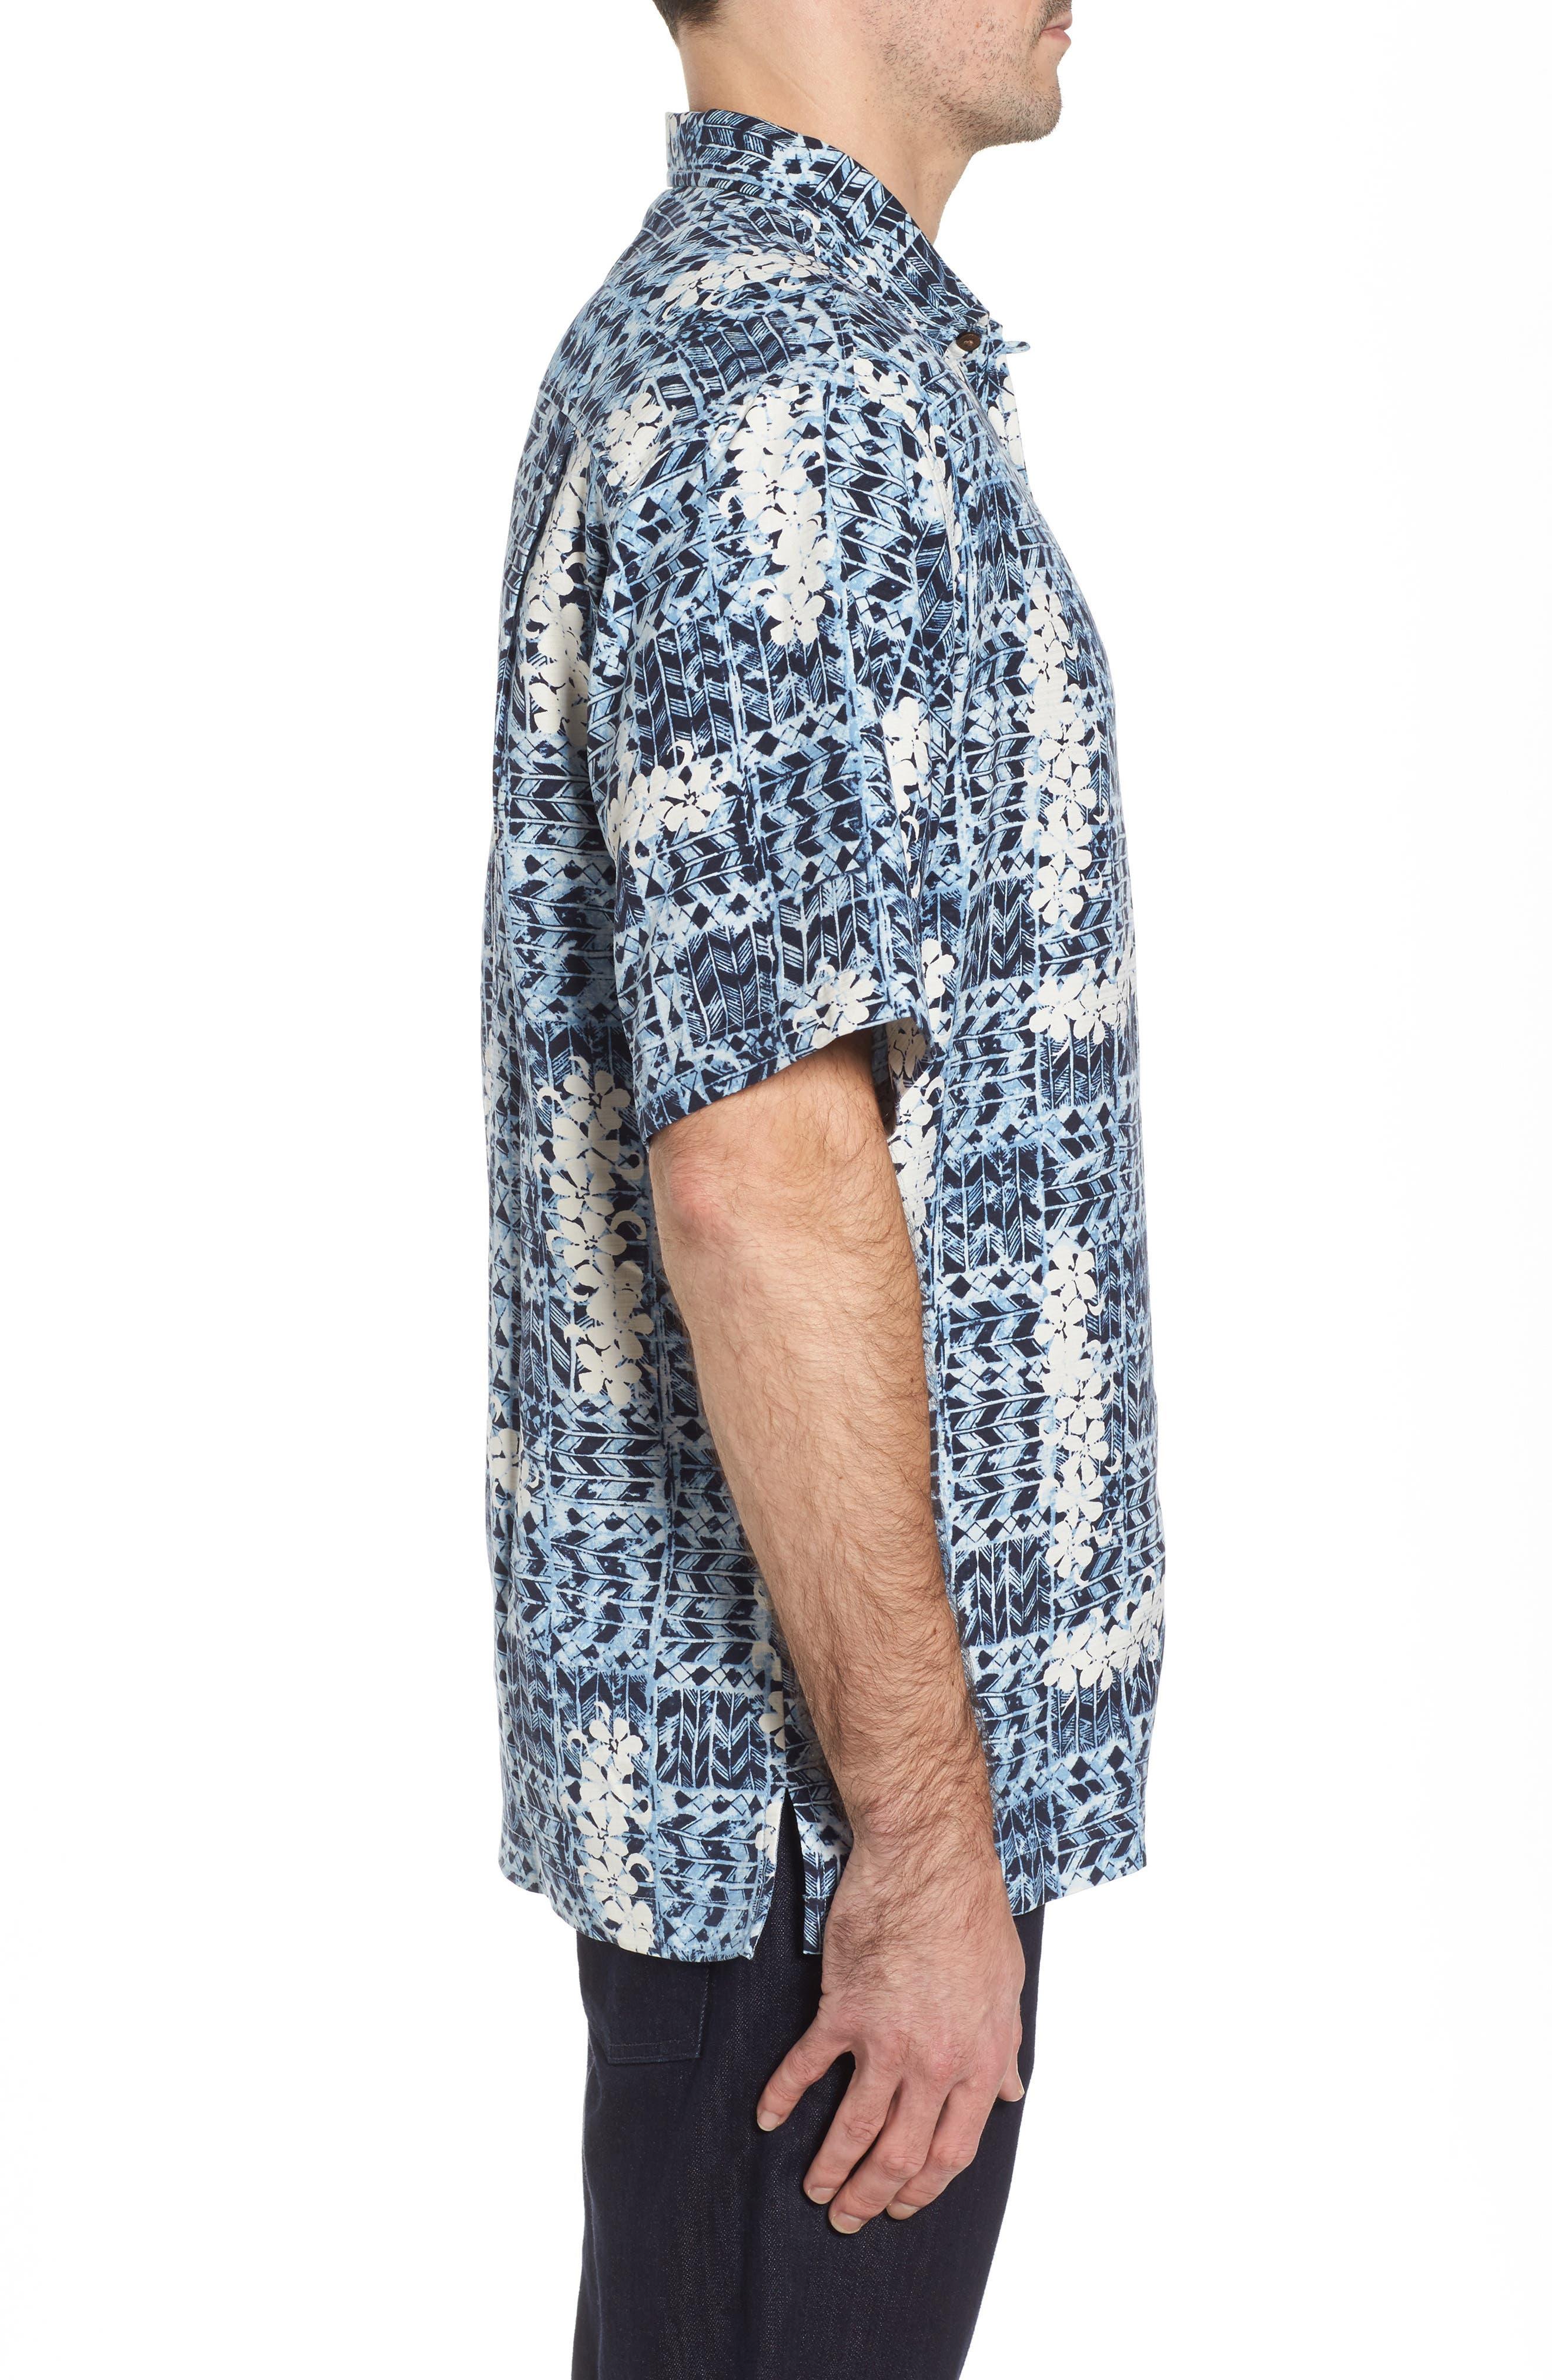 Olei Olei Silk Camp Shirt,                             Alternate thumbnail 3, color,                             Bering Blue